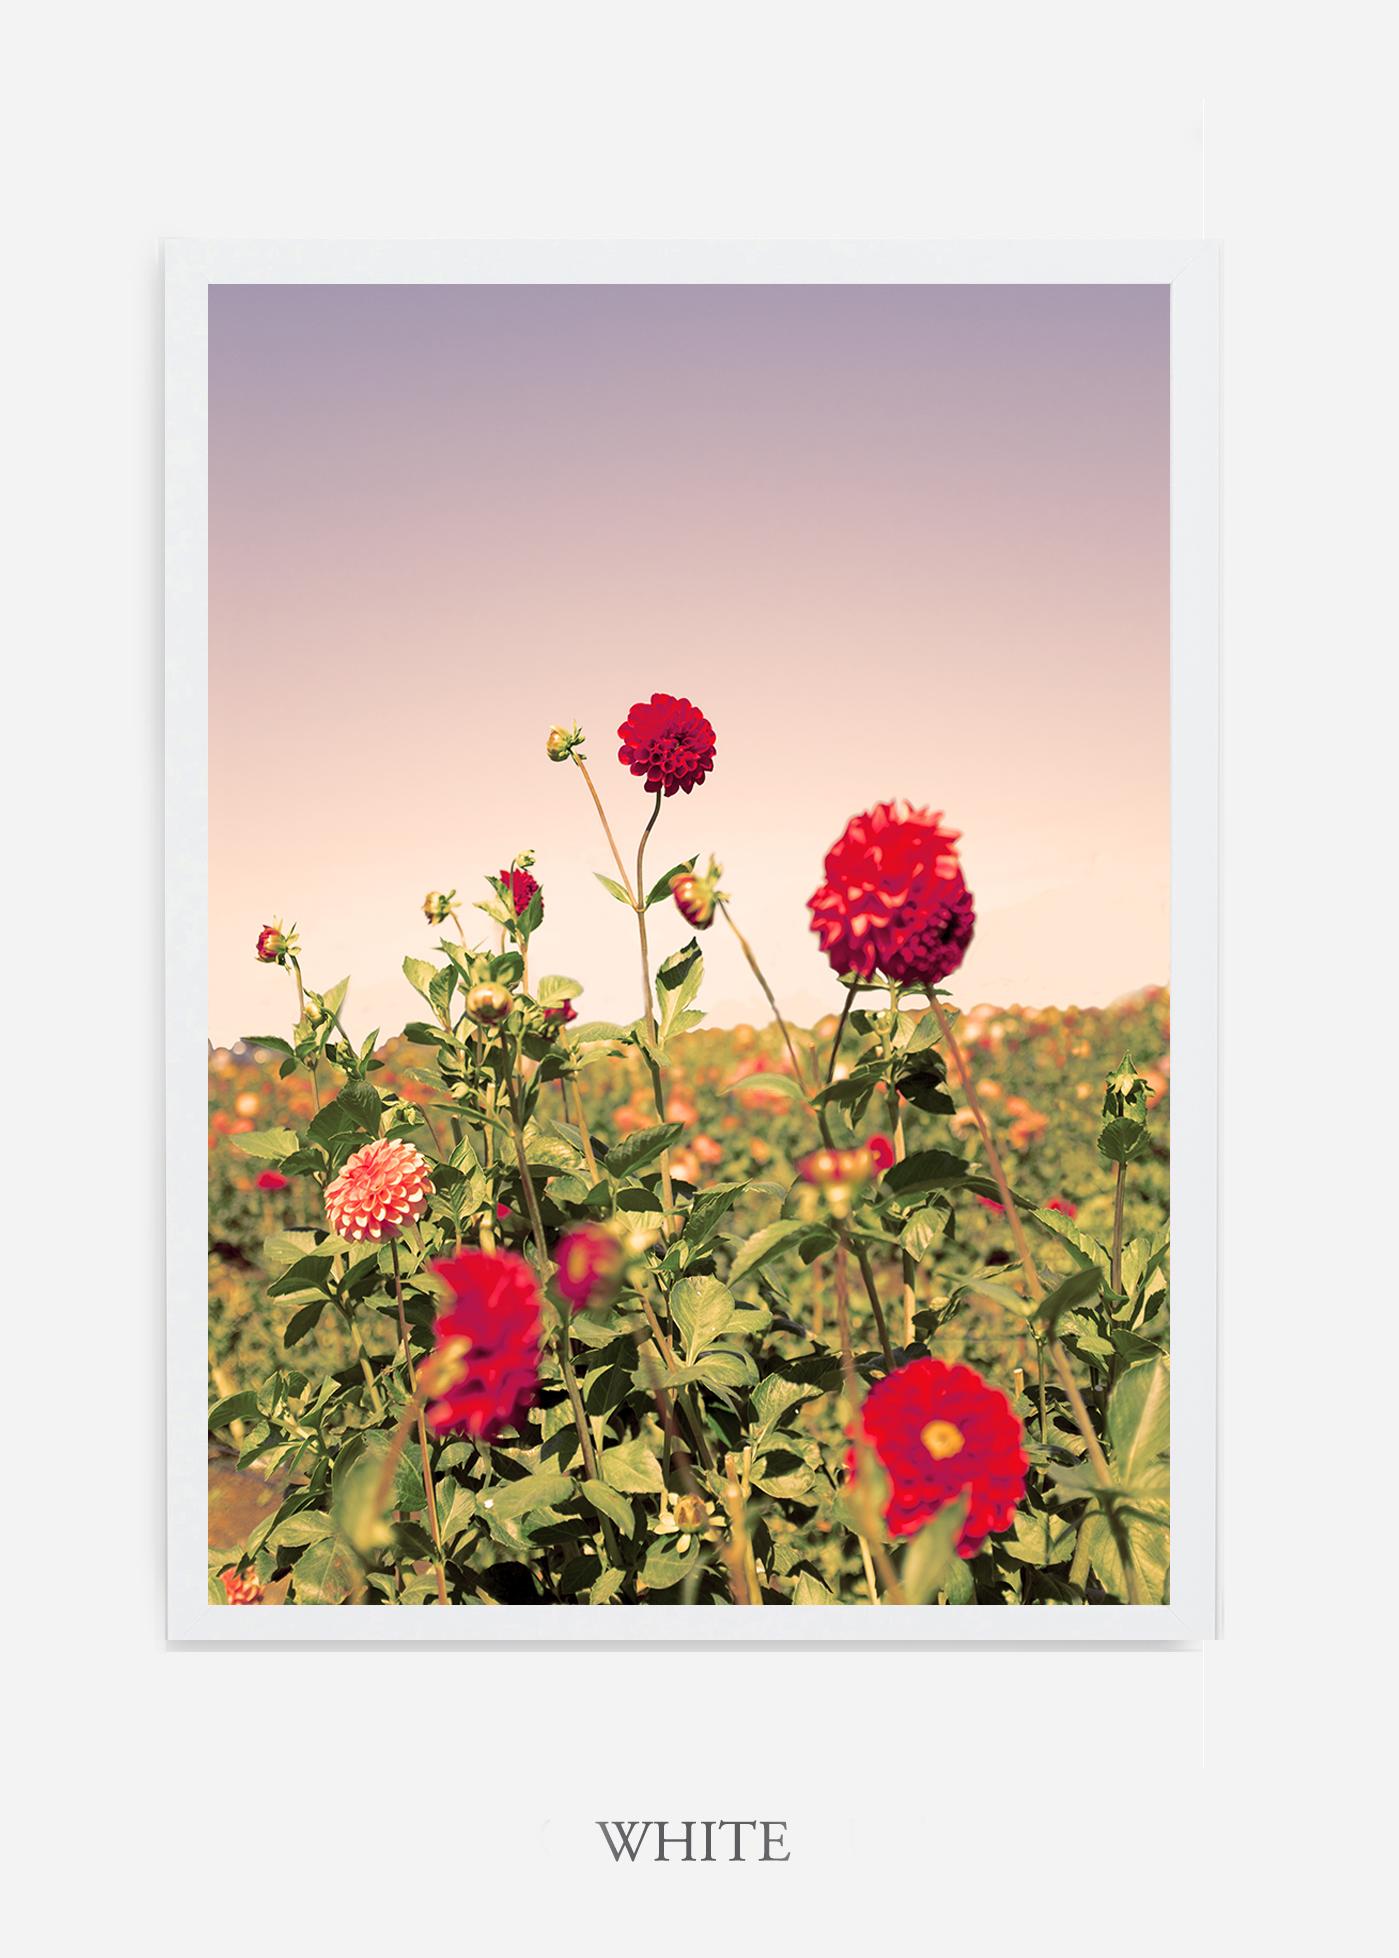 DahliaNo.8-white-frame-interior-design-botanical-print-art-wilder-california-wilder-paper.jpg